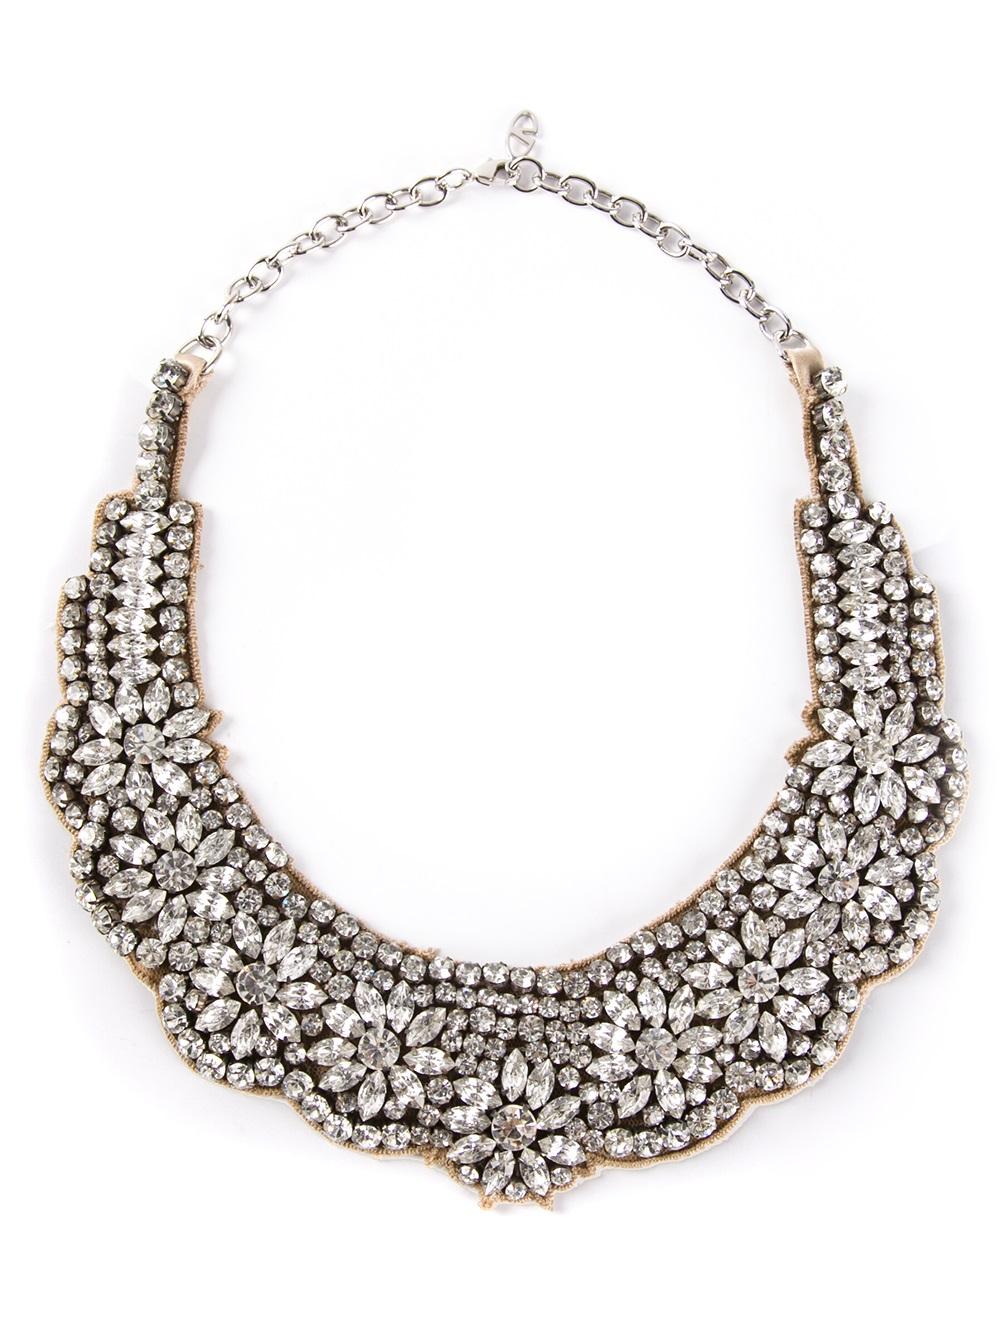 Valentino Garavani crystal-embellished necklace aIg40GI